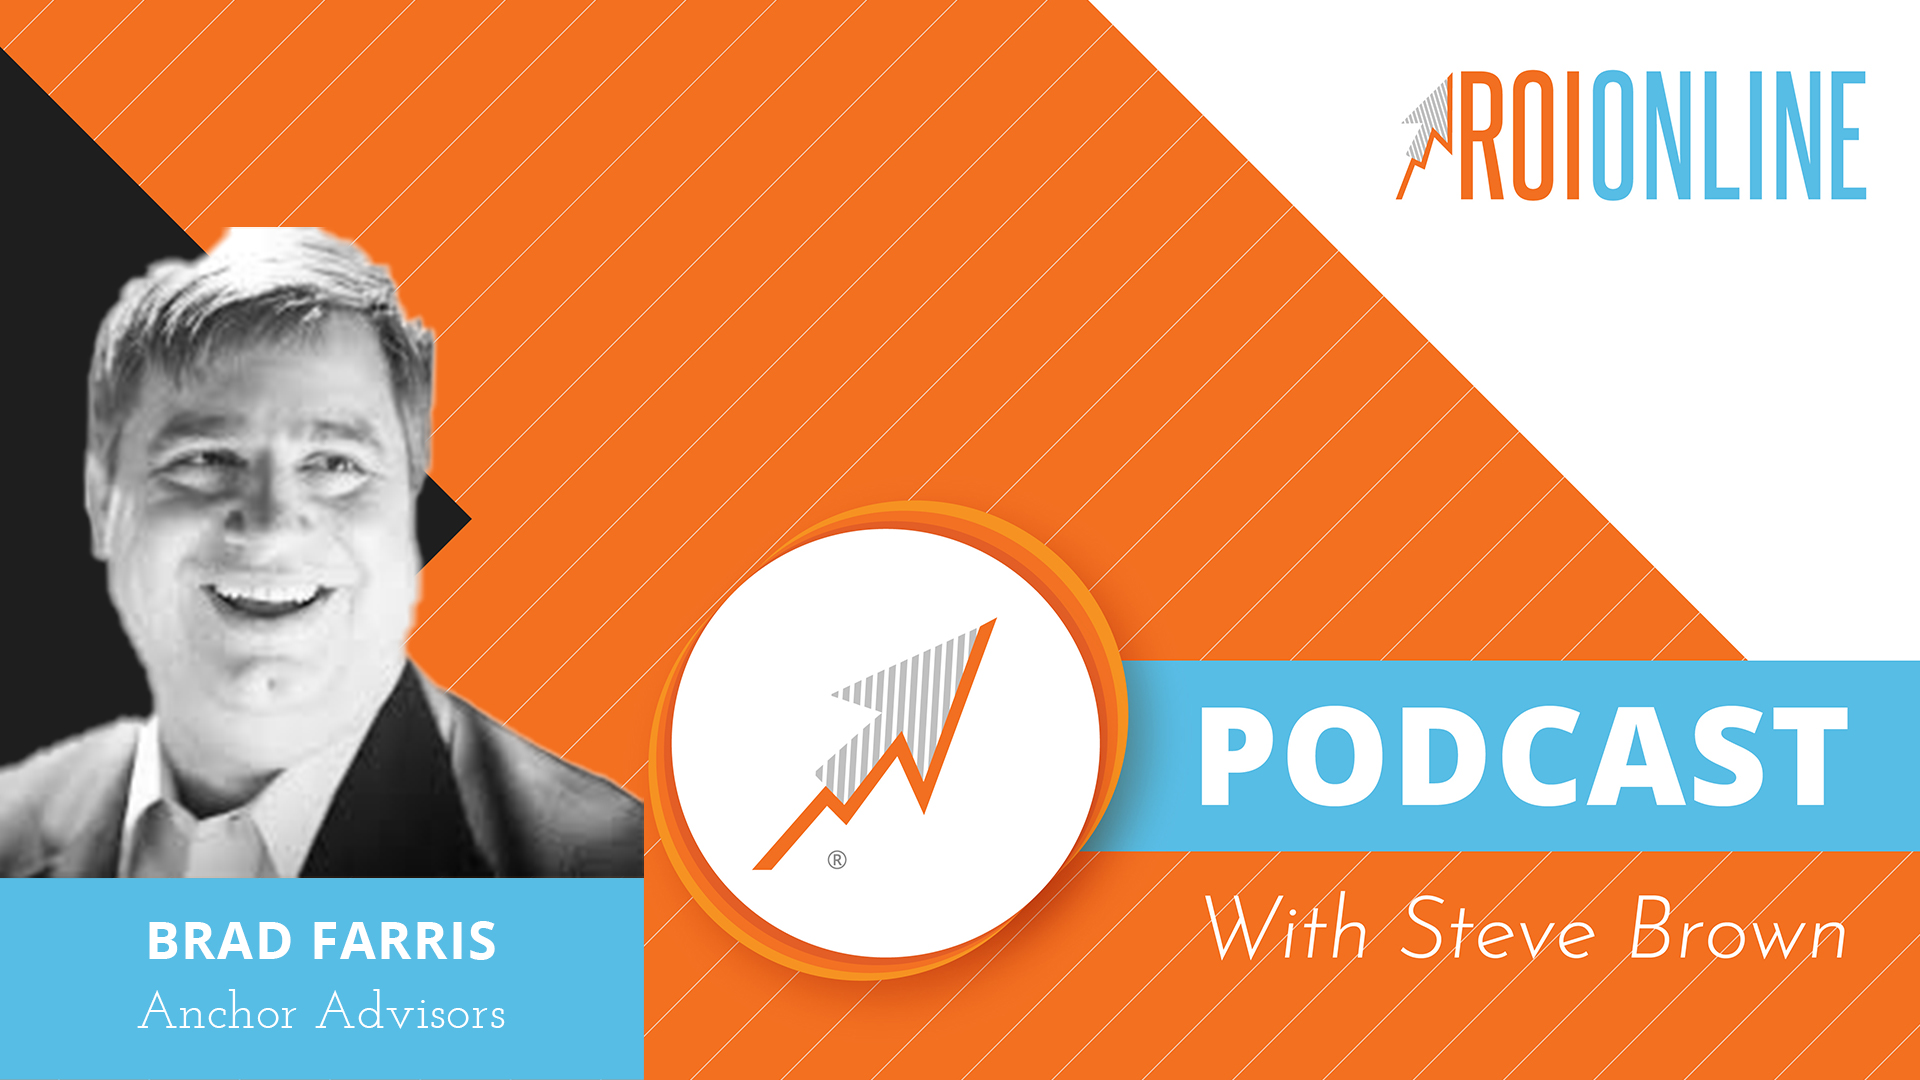 Brad Farris podcast thumbnail graphic